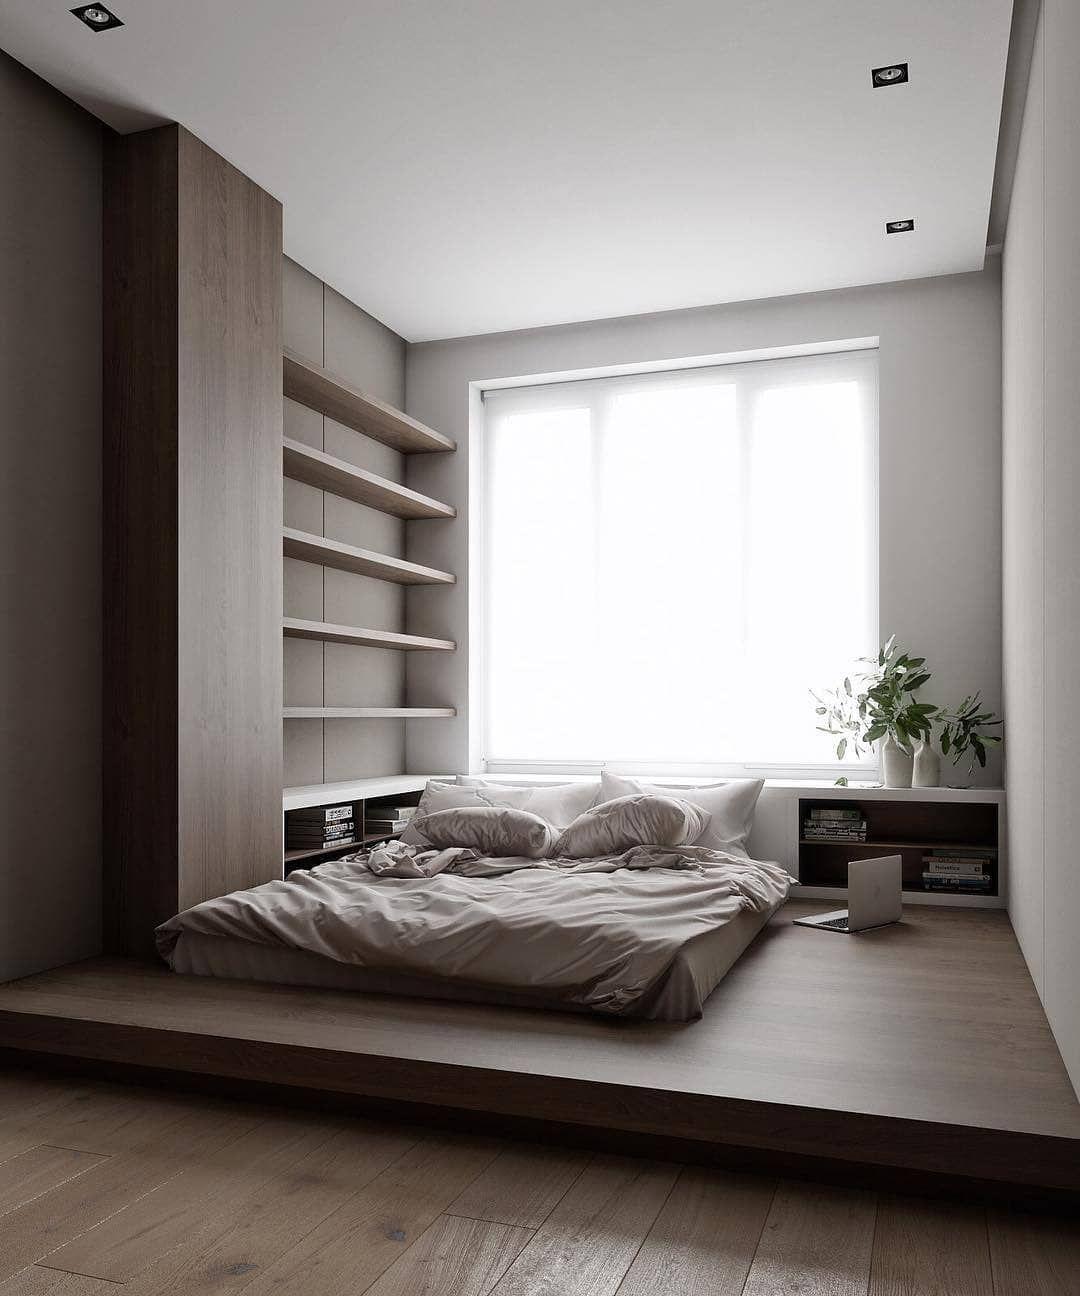 Best S This Too Minimal Linxinterior ห้องนอนใหญ่ ไอเดีย 400 x 300